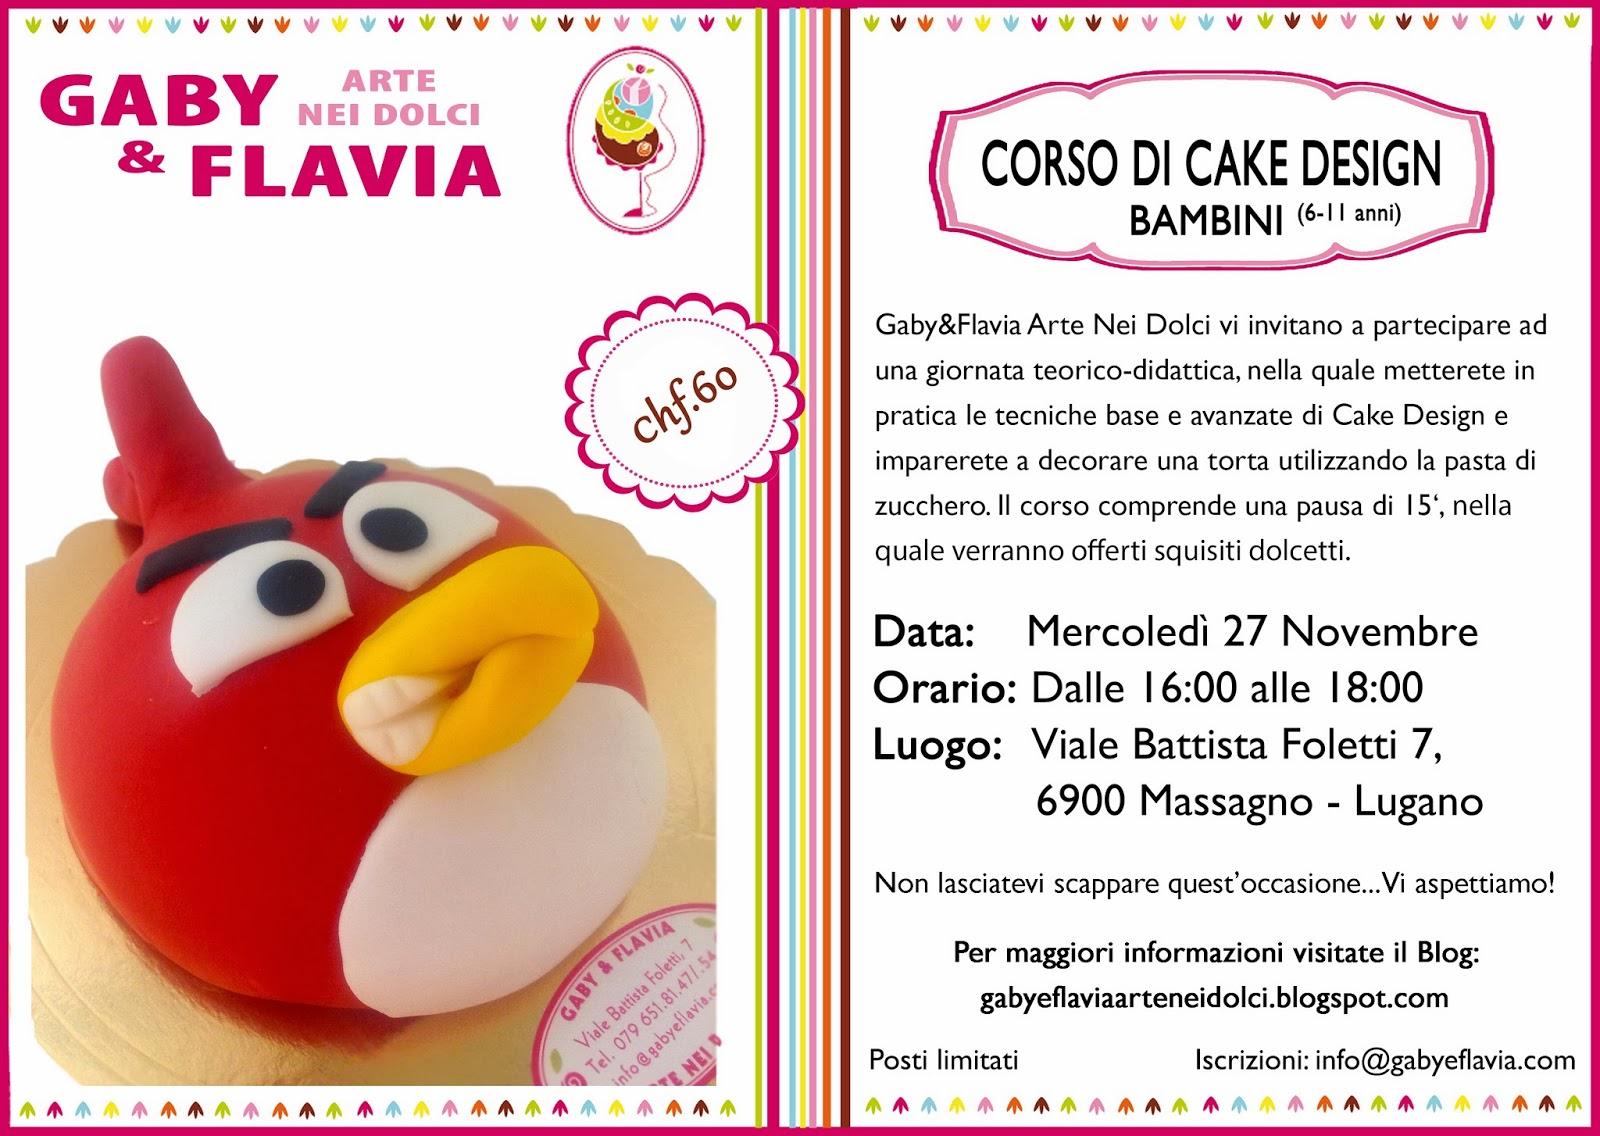 Corso Cake Design Catania 2018 : CORSO DI CAKE DESIGN BAMBINI NOVEMBRE 2013 ARTE NEI DOLCI